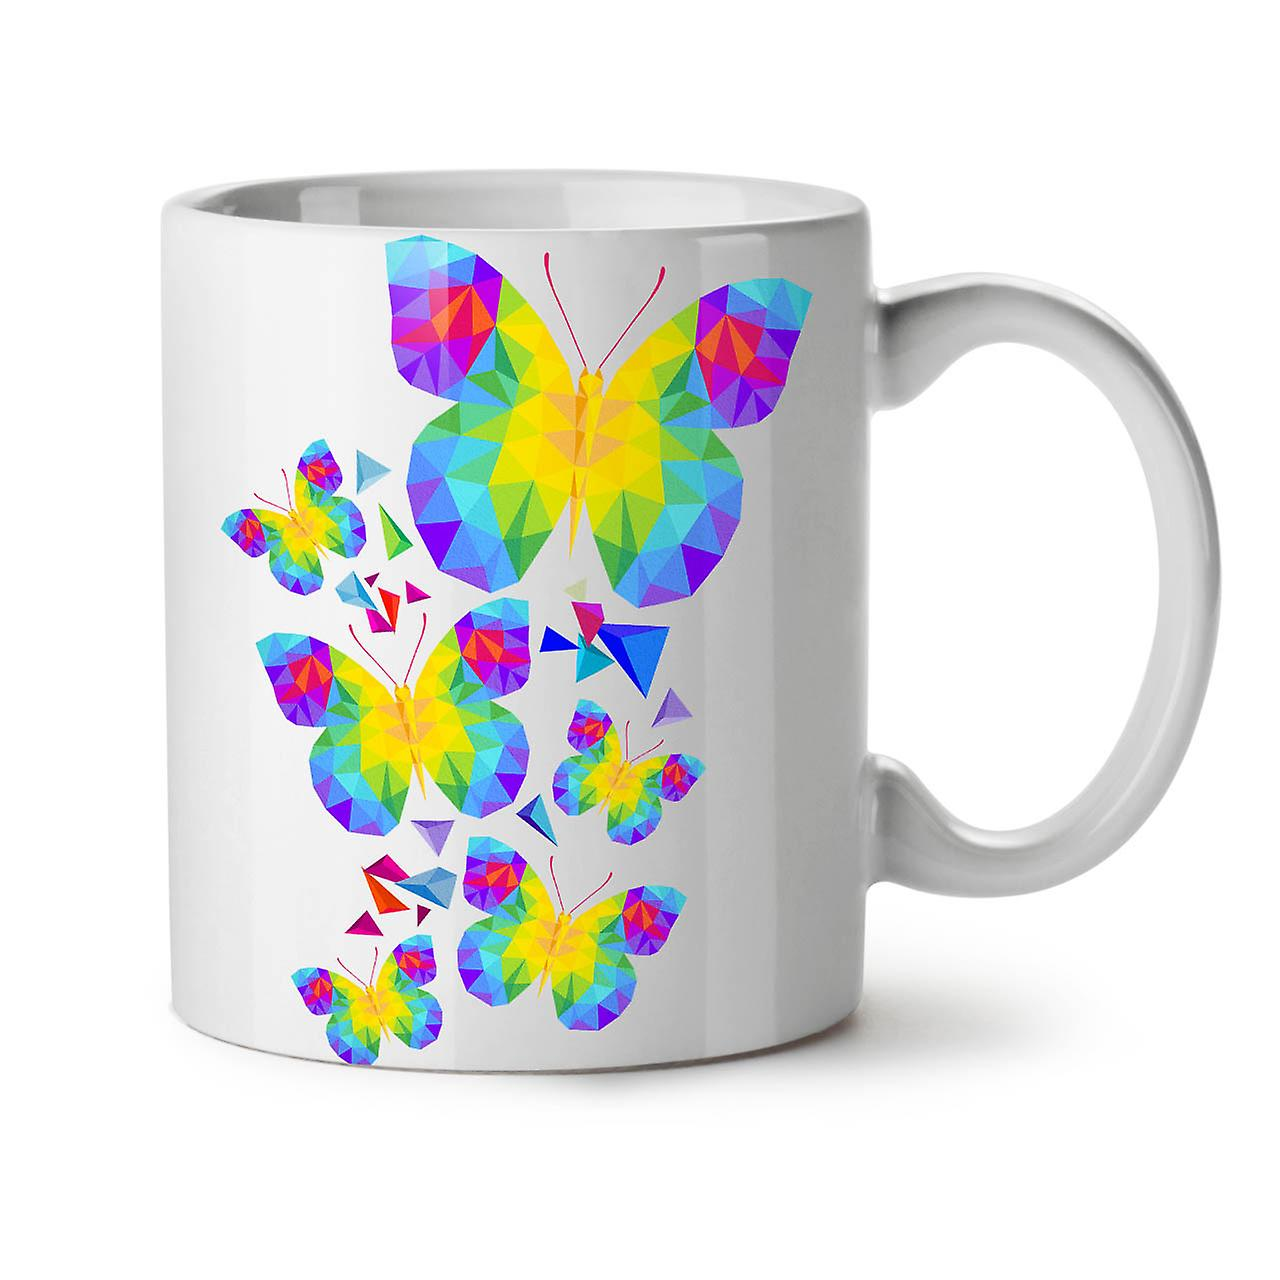 Nouveau Café Tasse Céramique Blanc OzWellcoda Papillon Polygonale Thé 11 OuTPkXilwZ